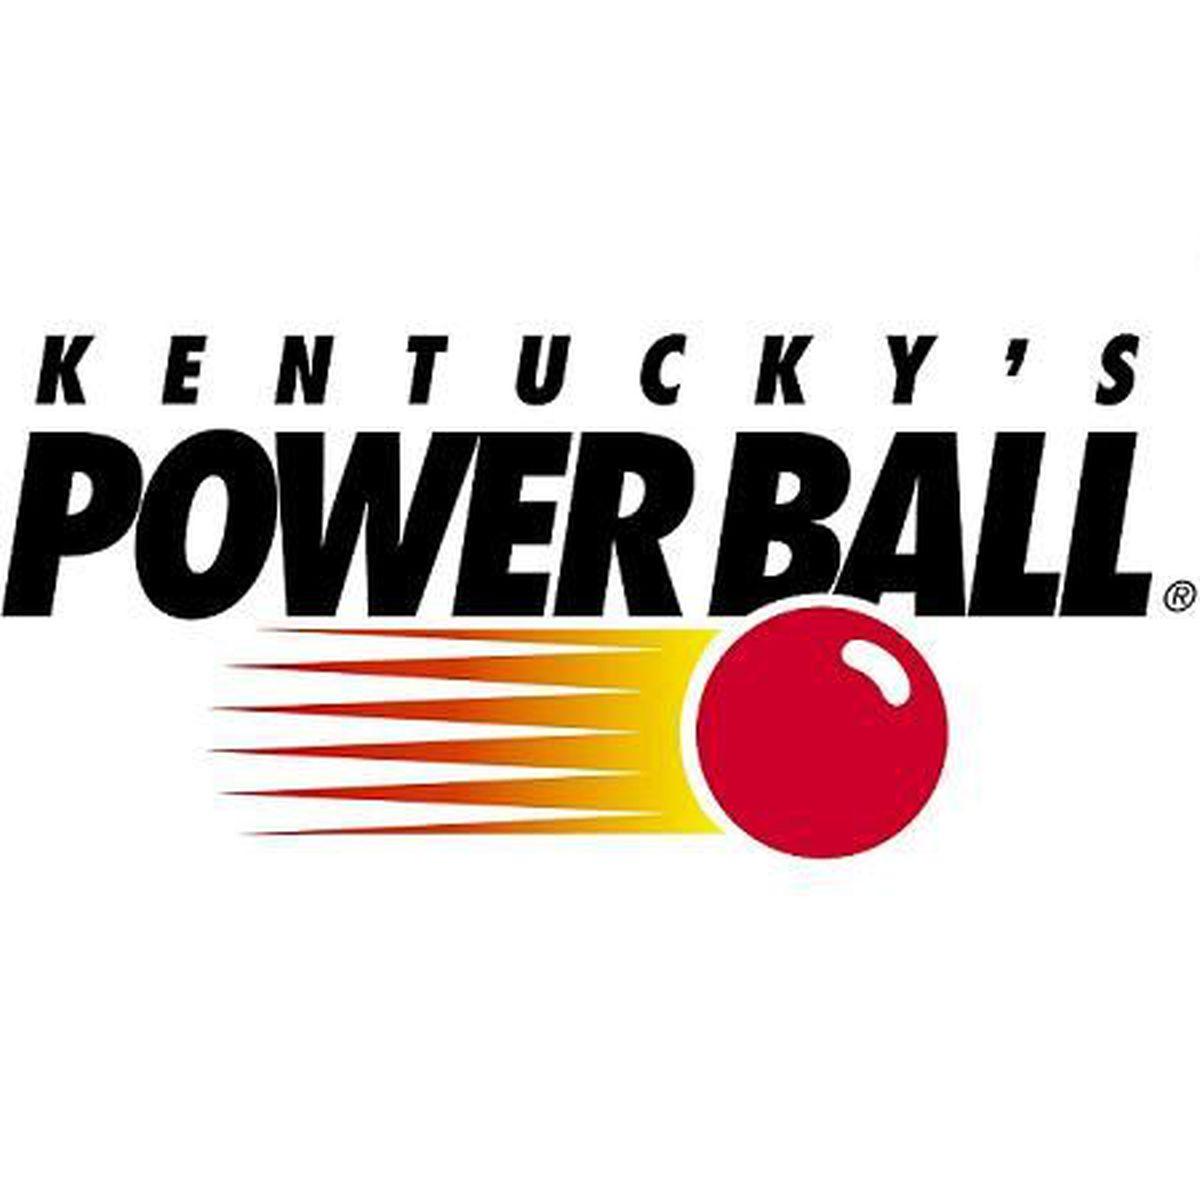 Kentucky Powerball